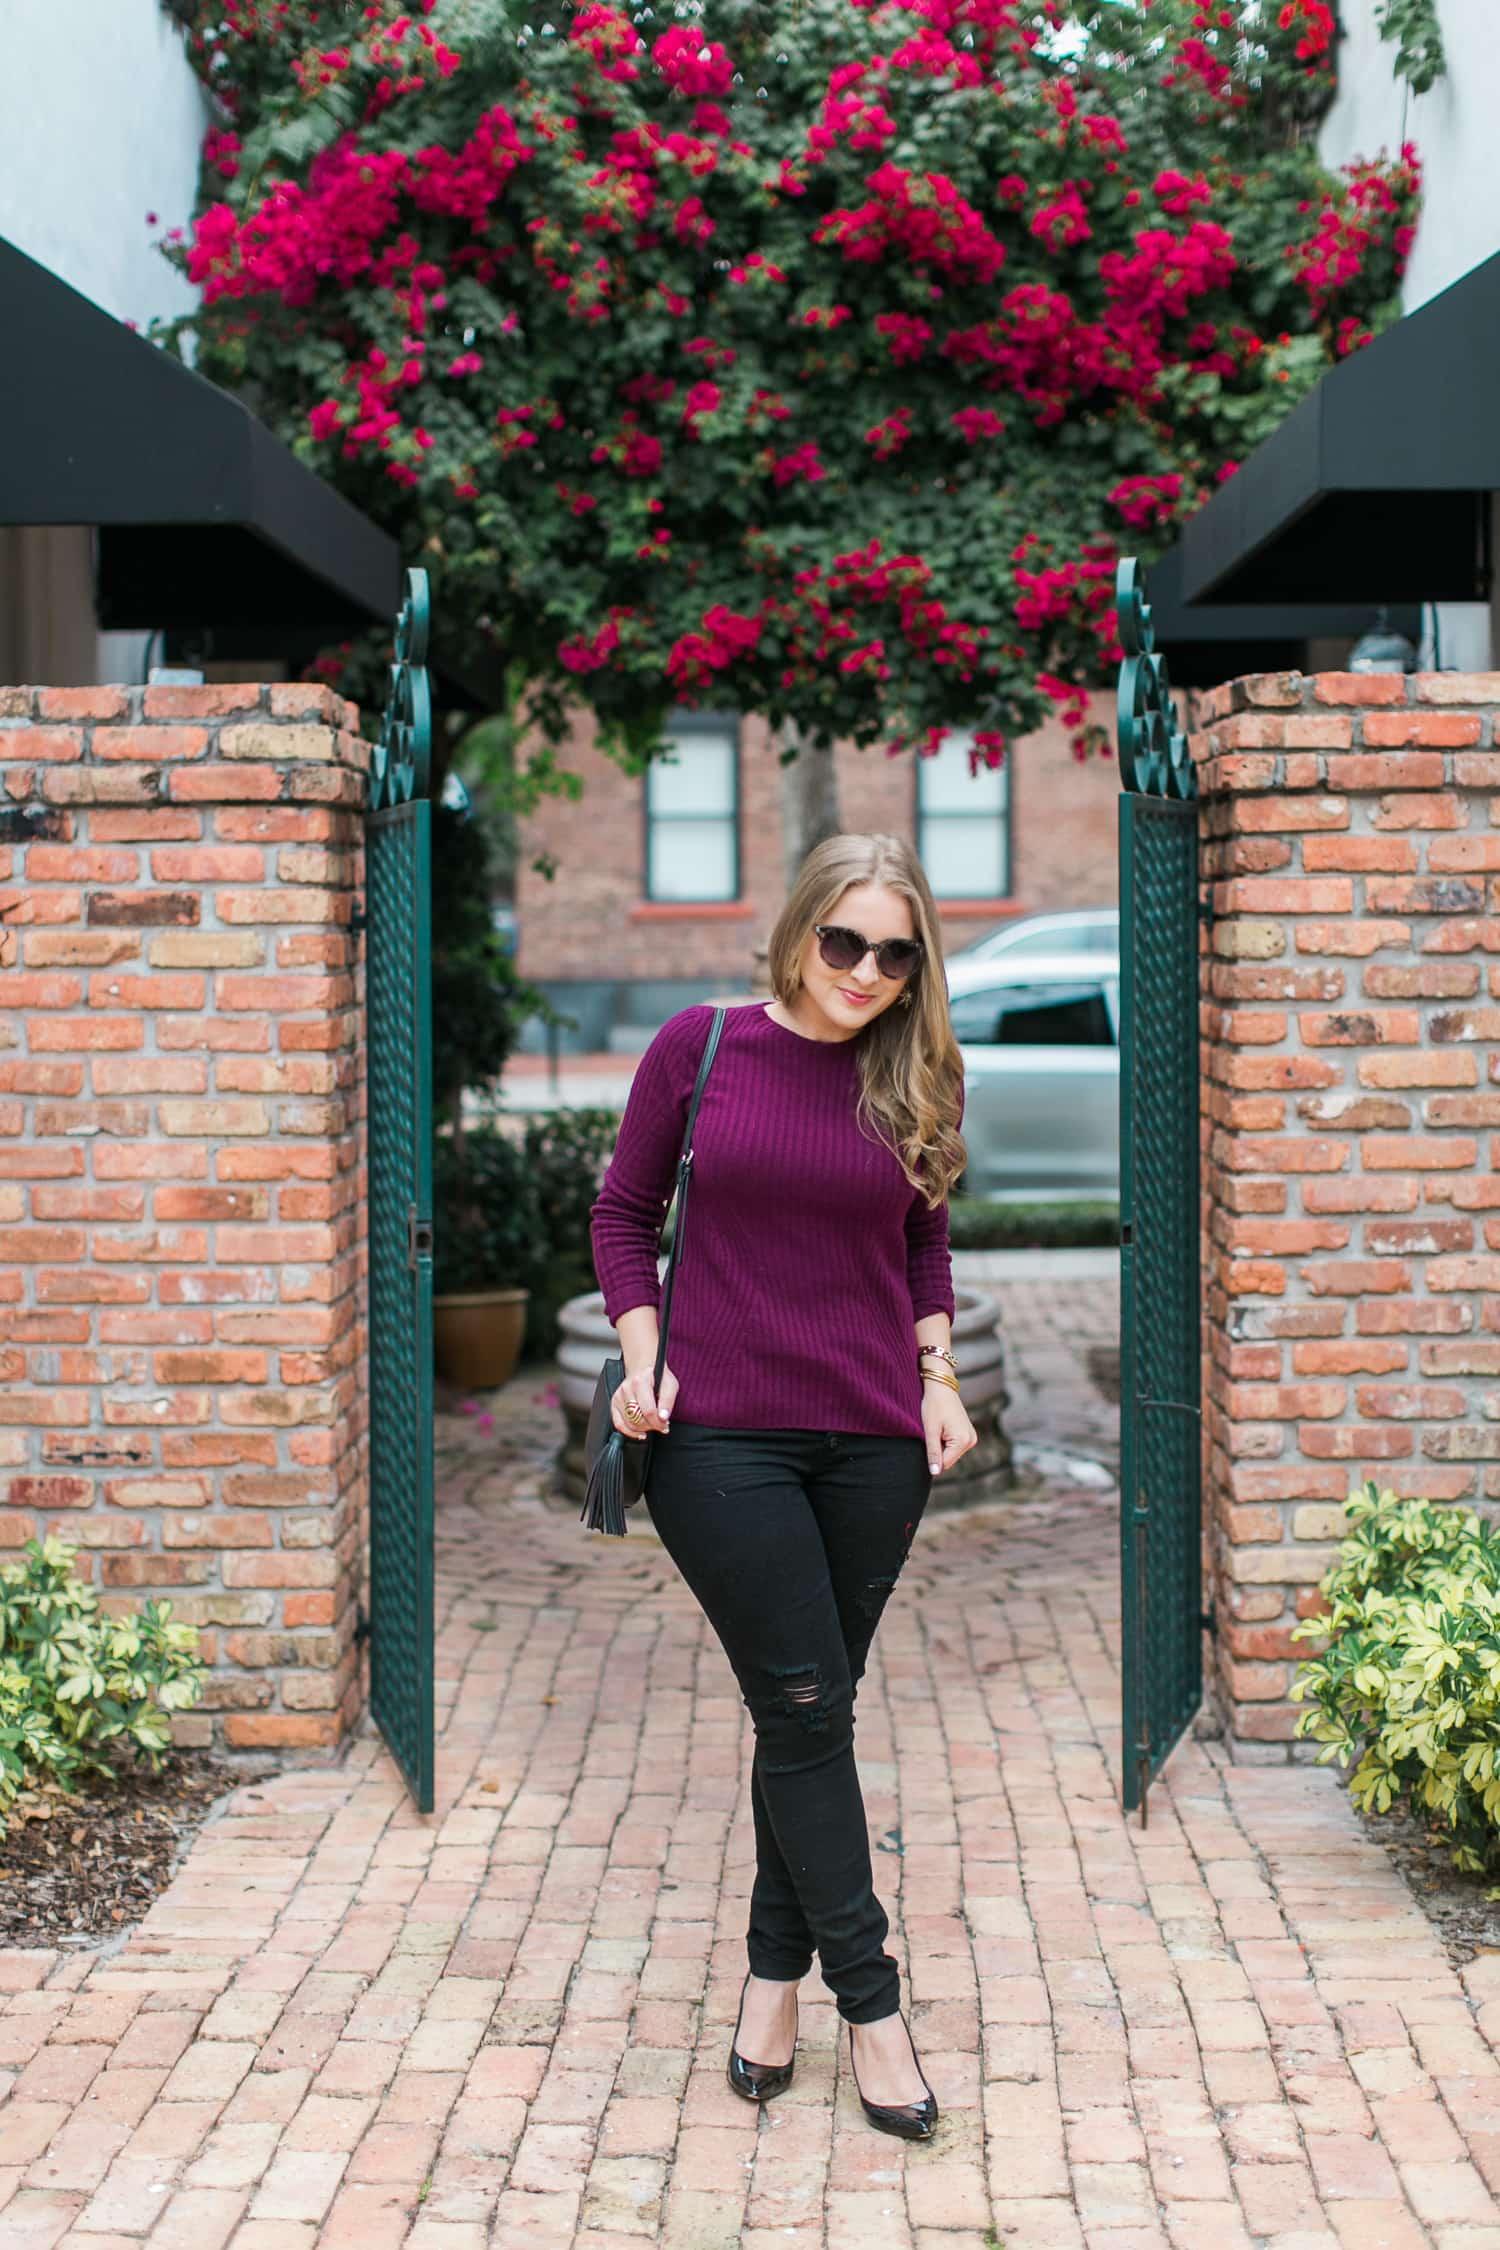 black-ripped-jeans-retro-round-sunglasses-burgundy-cashmere-sweater-black-pointy-toe-pumps-tassel-handbag-004